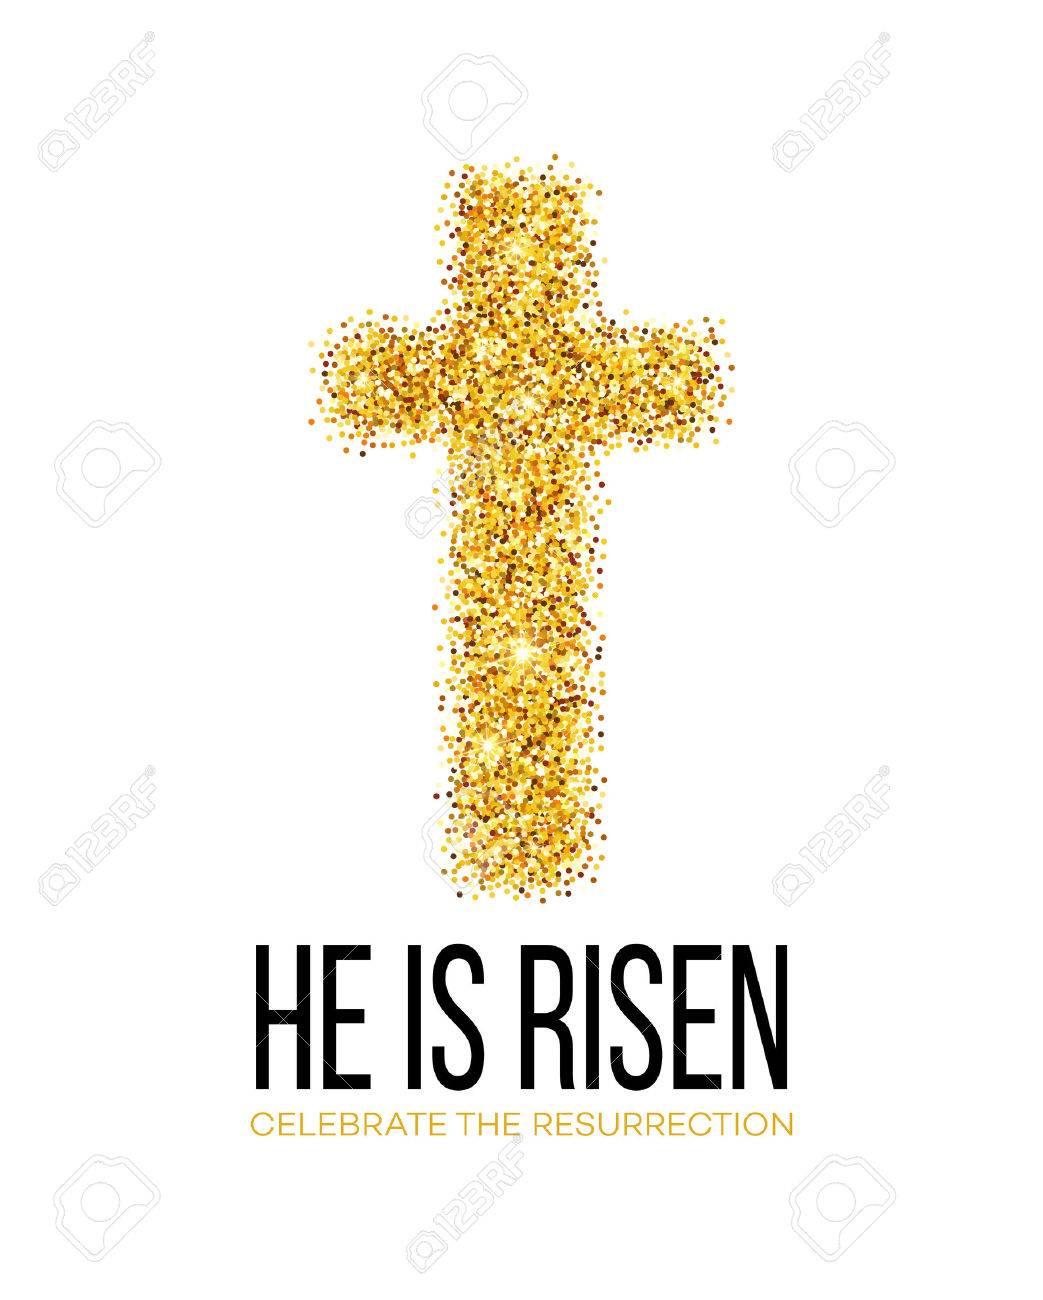 He is risen. Easter background. Vector illustration EPS10 - 52029047